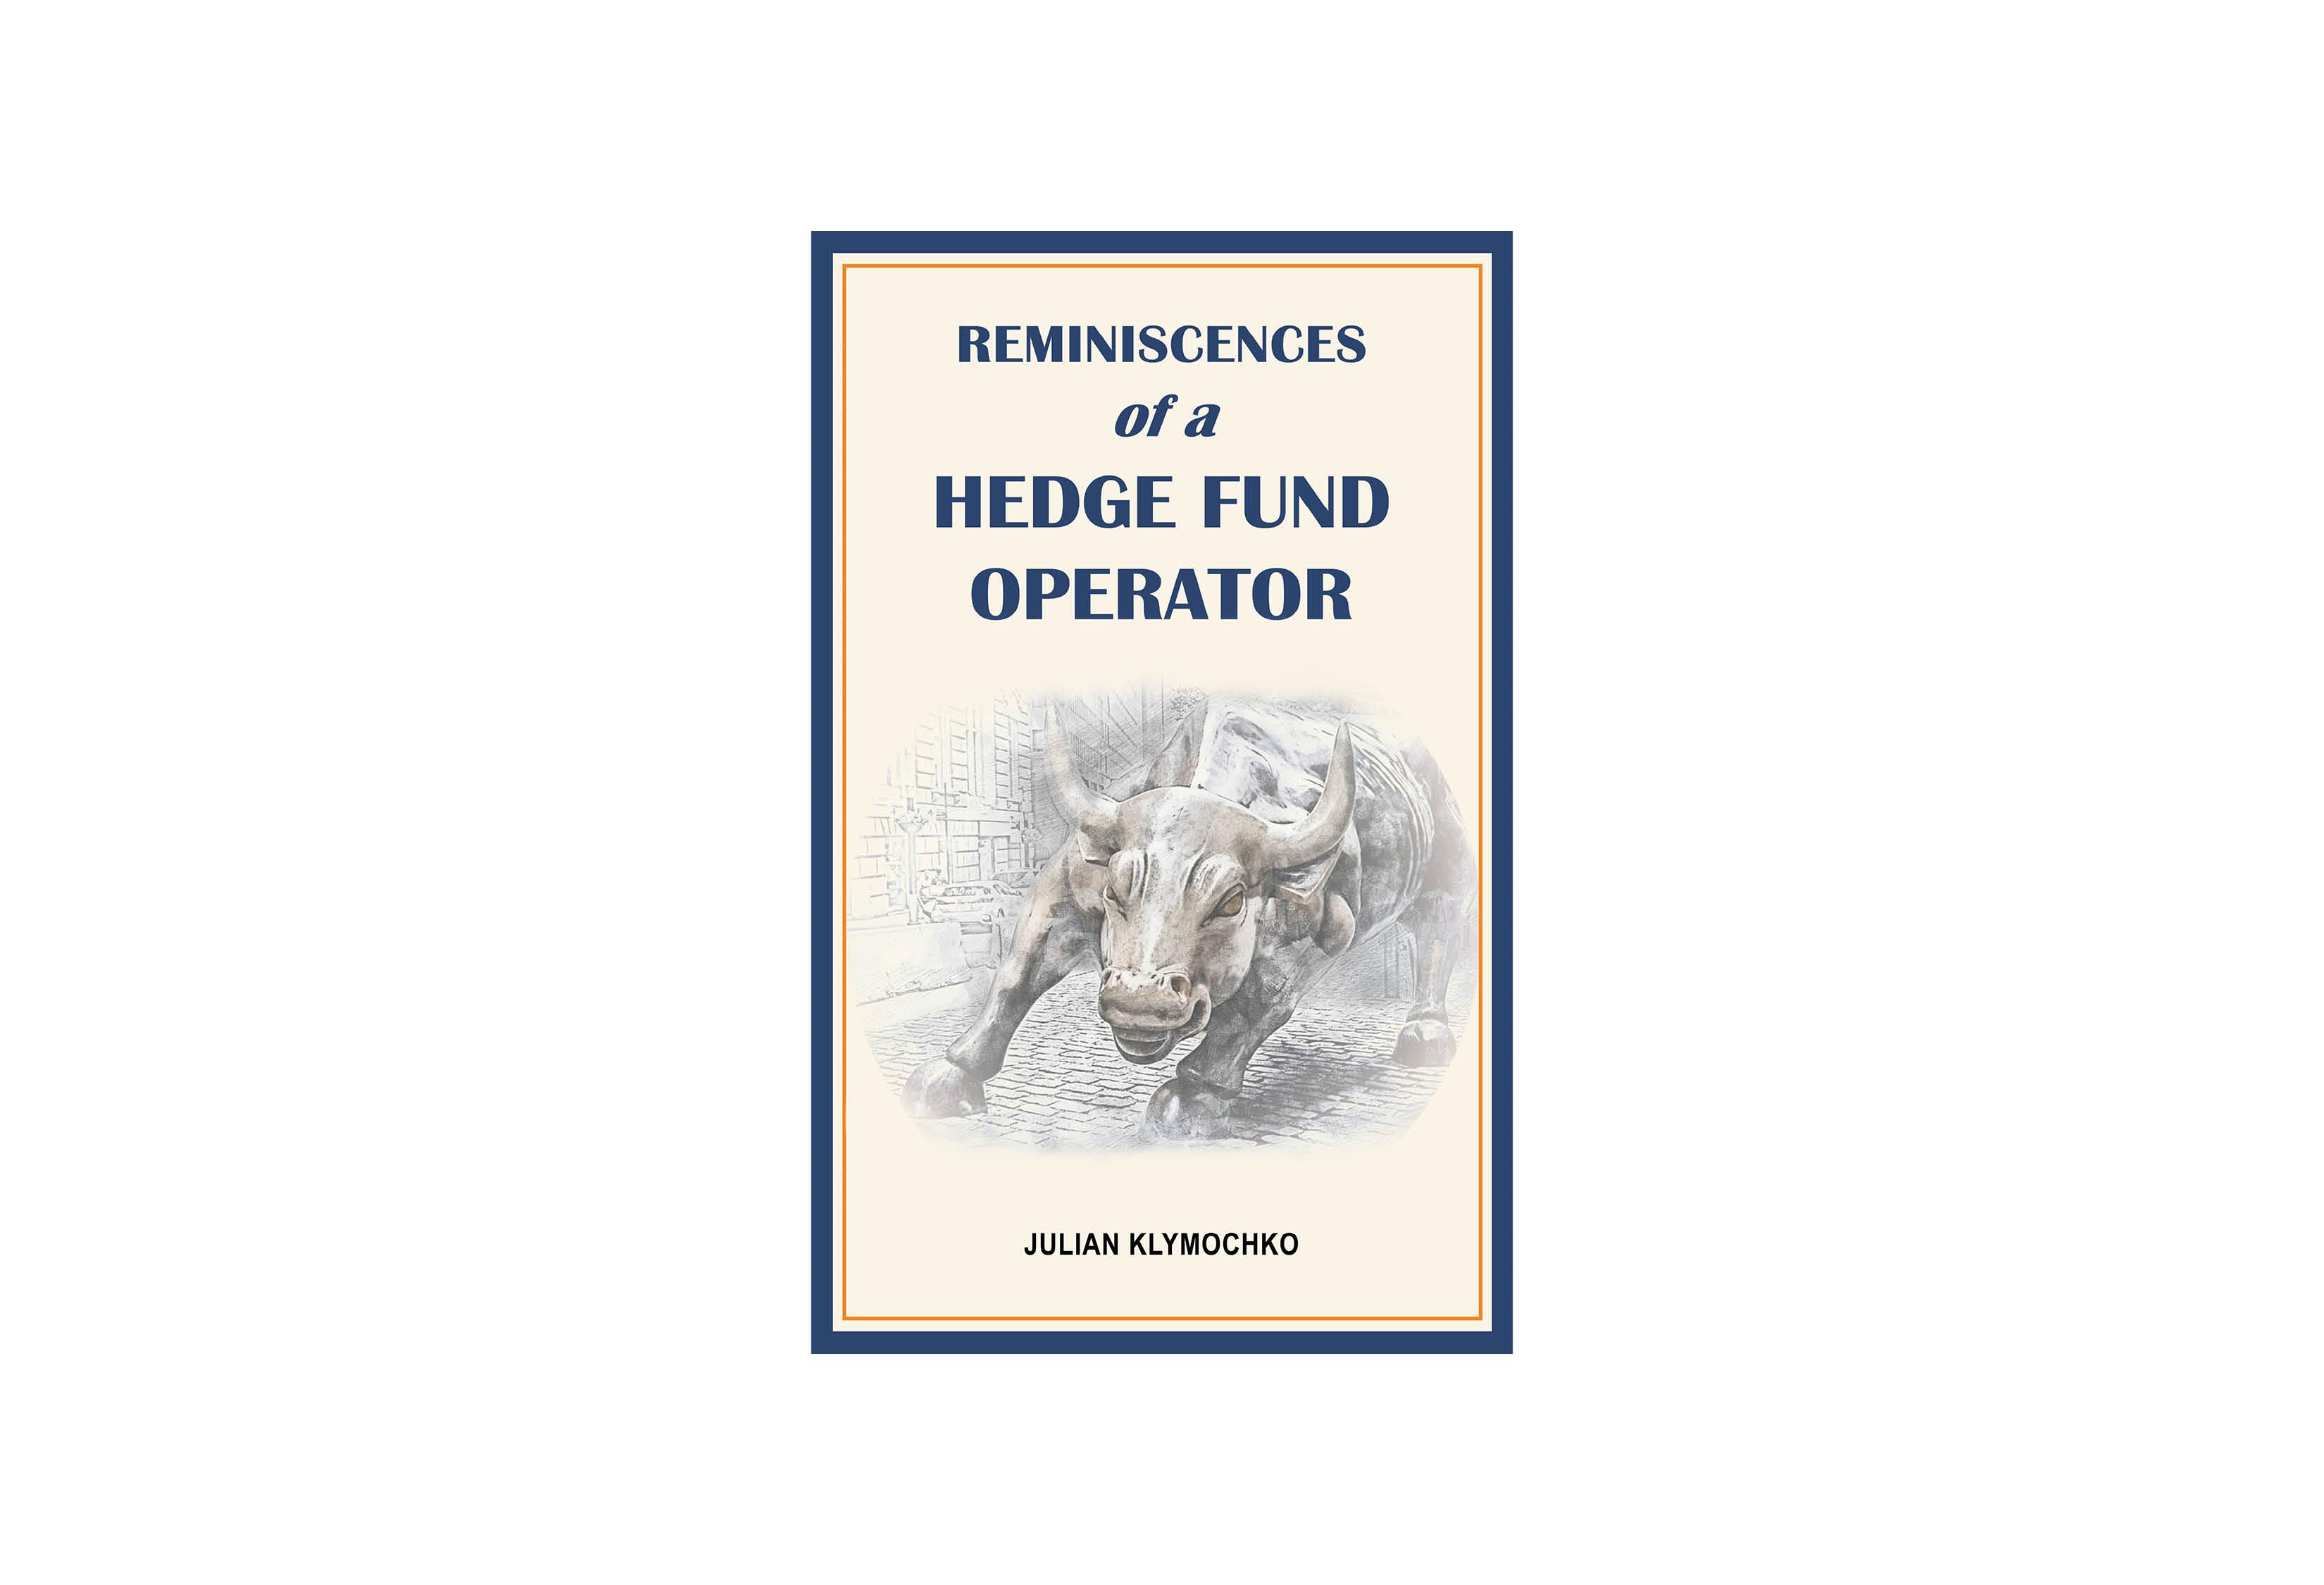 accelerate shares,accelerate,accelerate financial technologies,accelerate fintech,accelerate stock price,TSX,ALFA,ATSX,HDGE,Accelerate stocks,Accelerate shares,Canadian Stock Market,Canadian Stocks